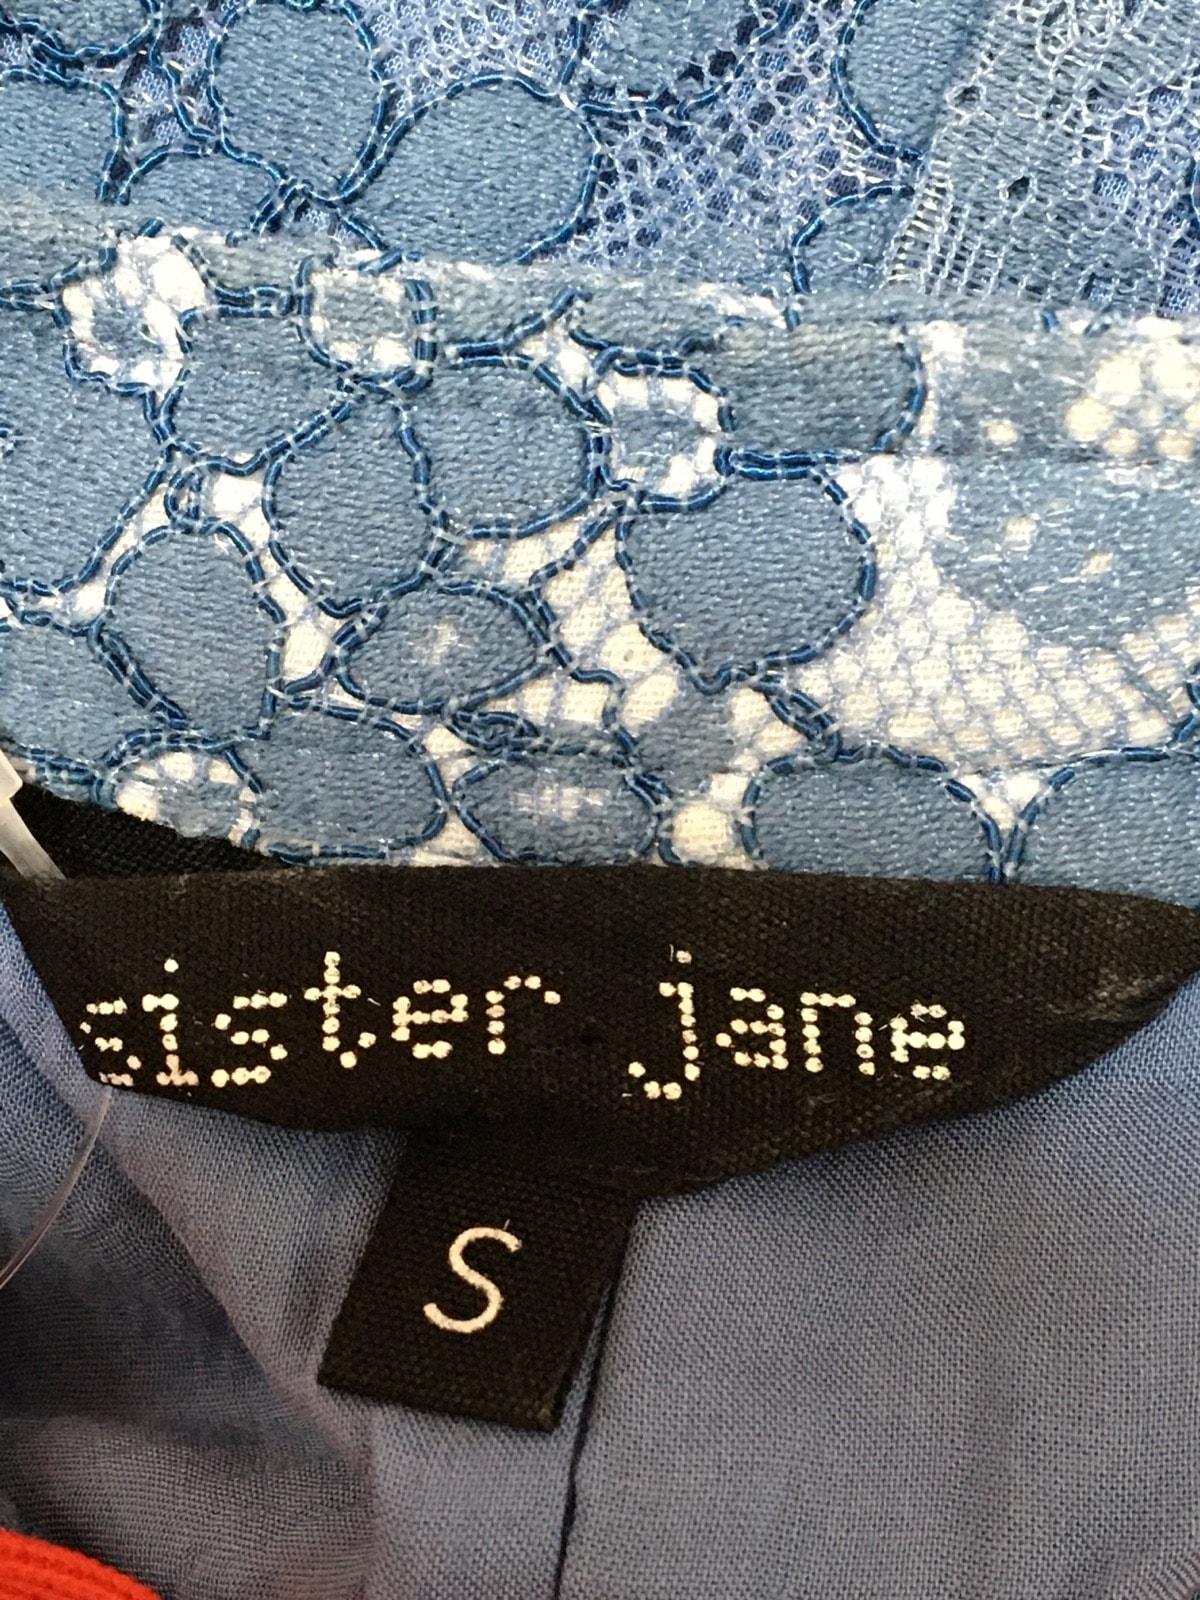 Sister Jane(シスタージェーン)のワンピース